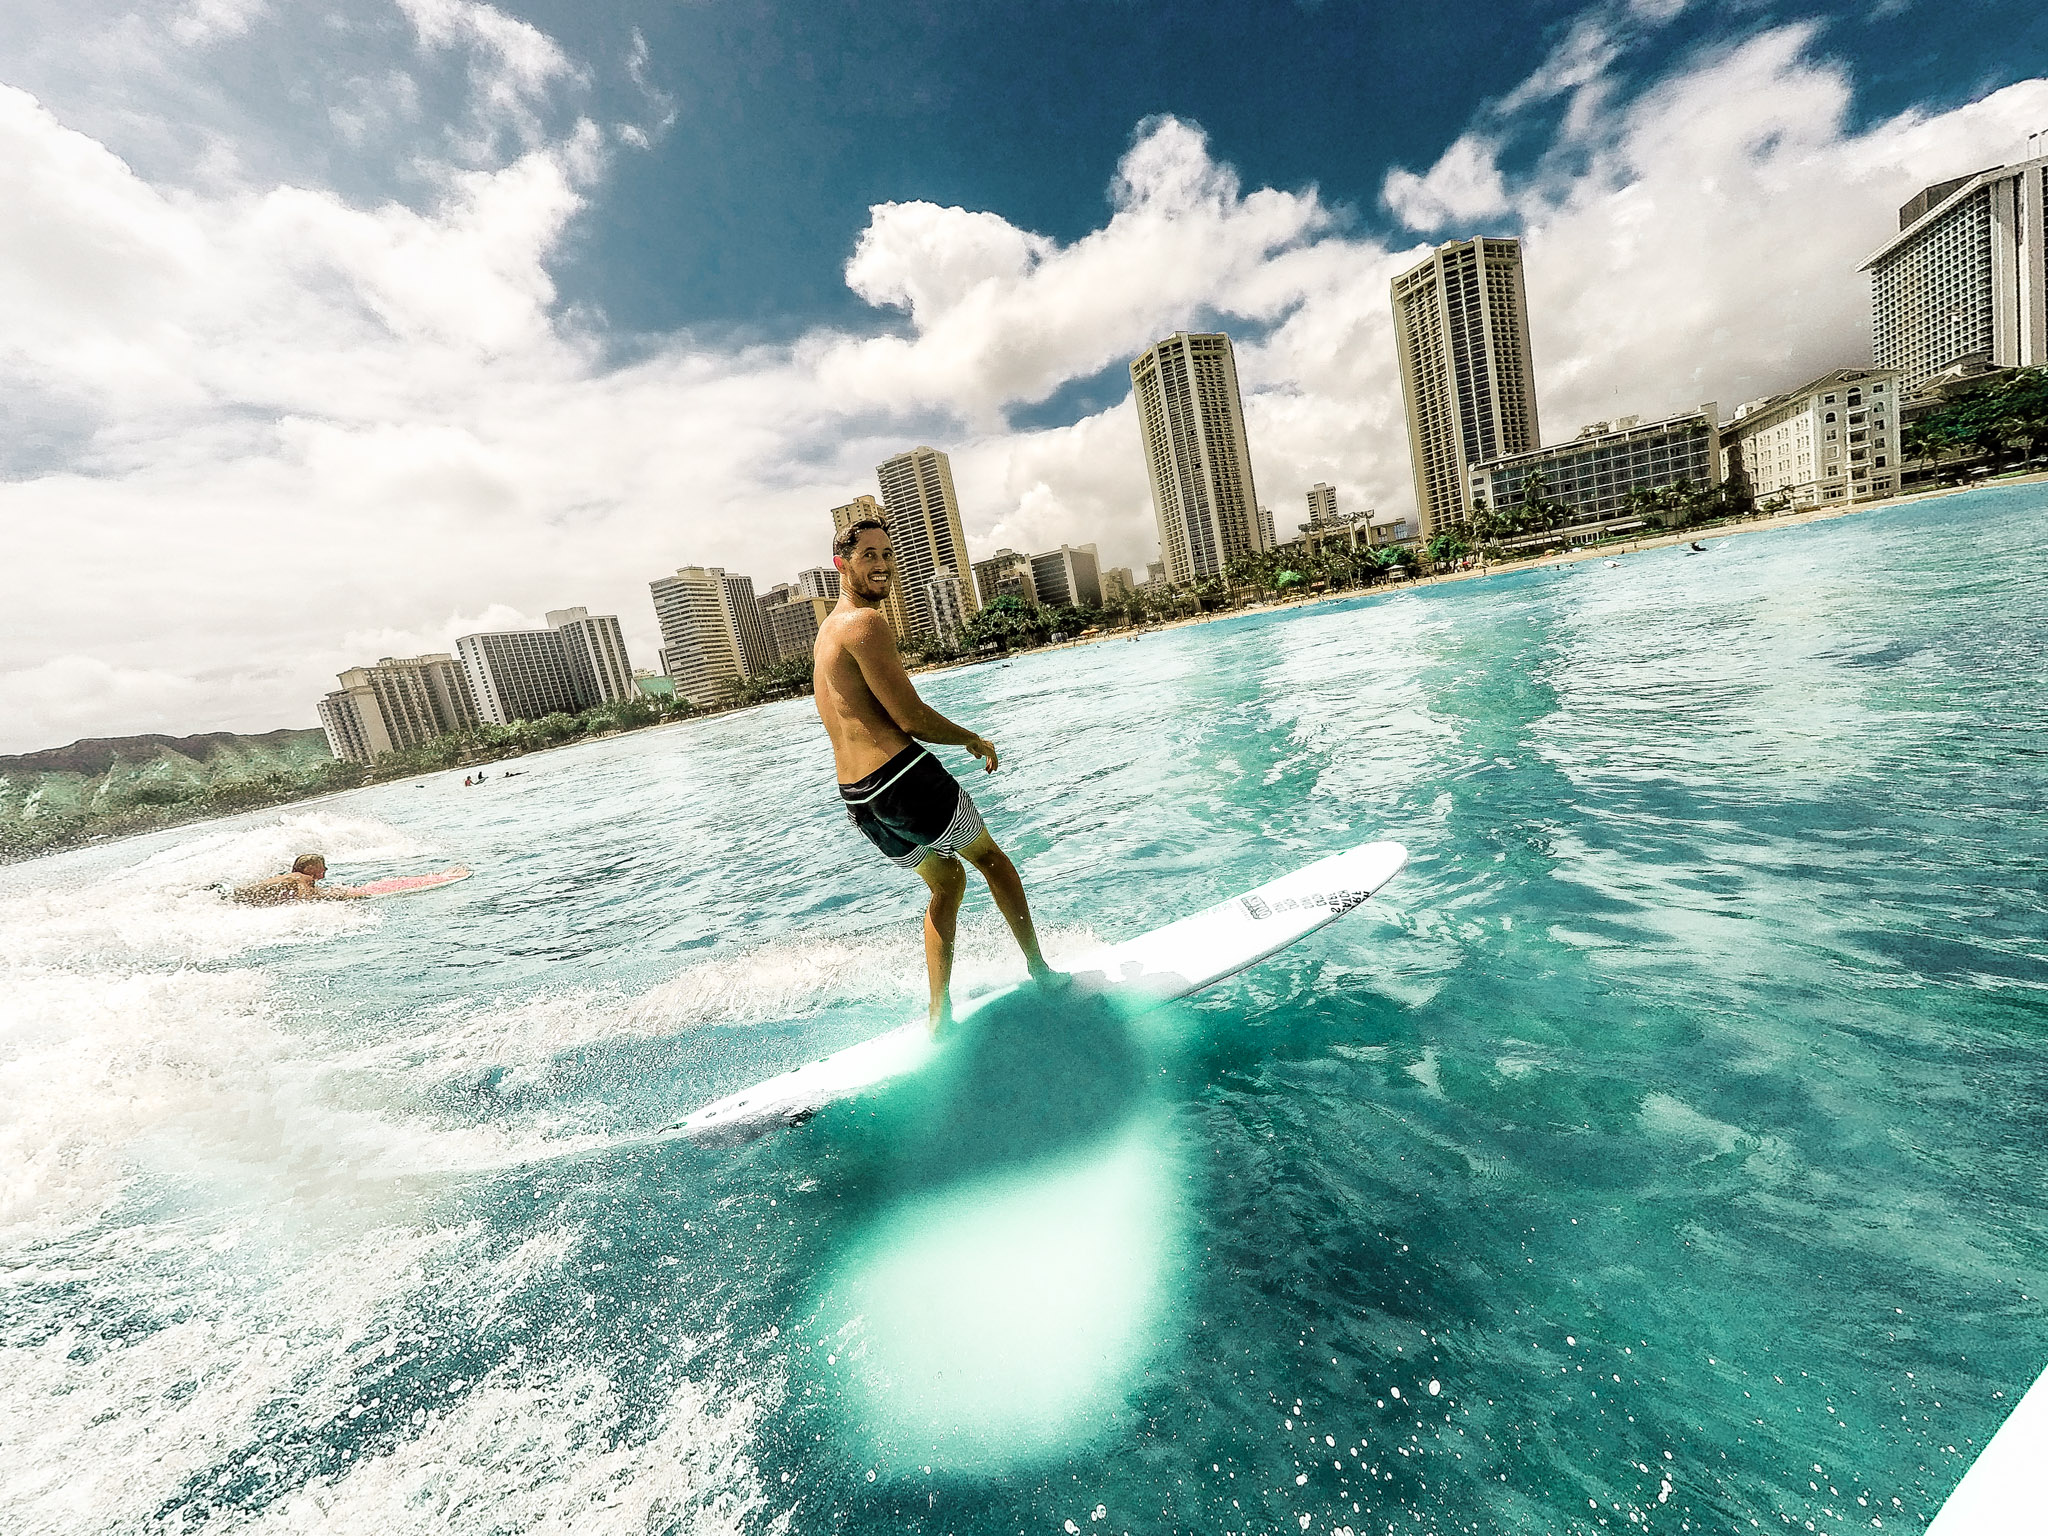 Jon-Olsson-Hawaii.jpg